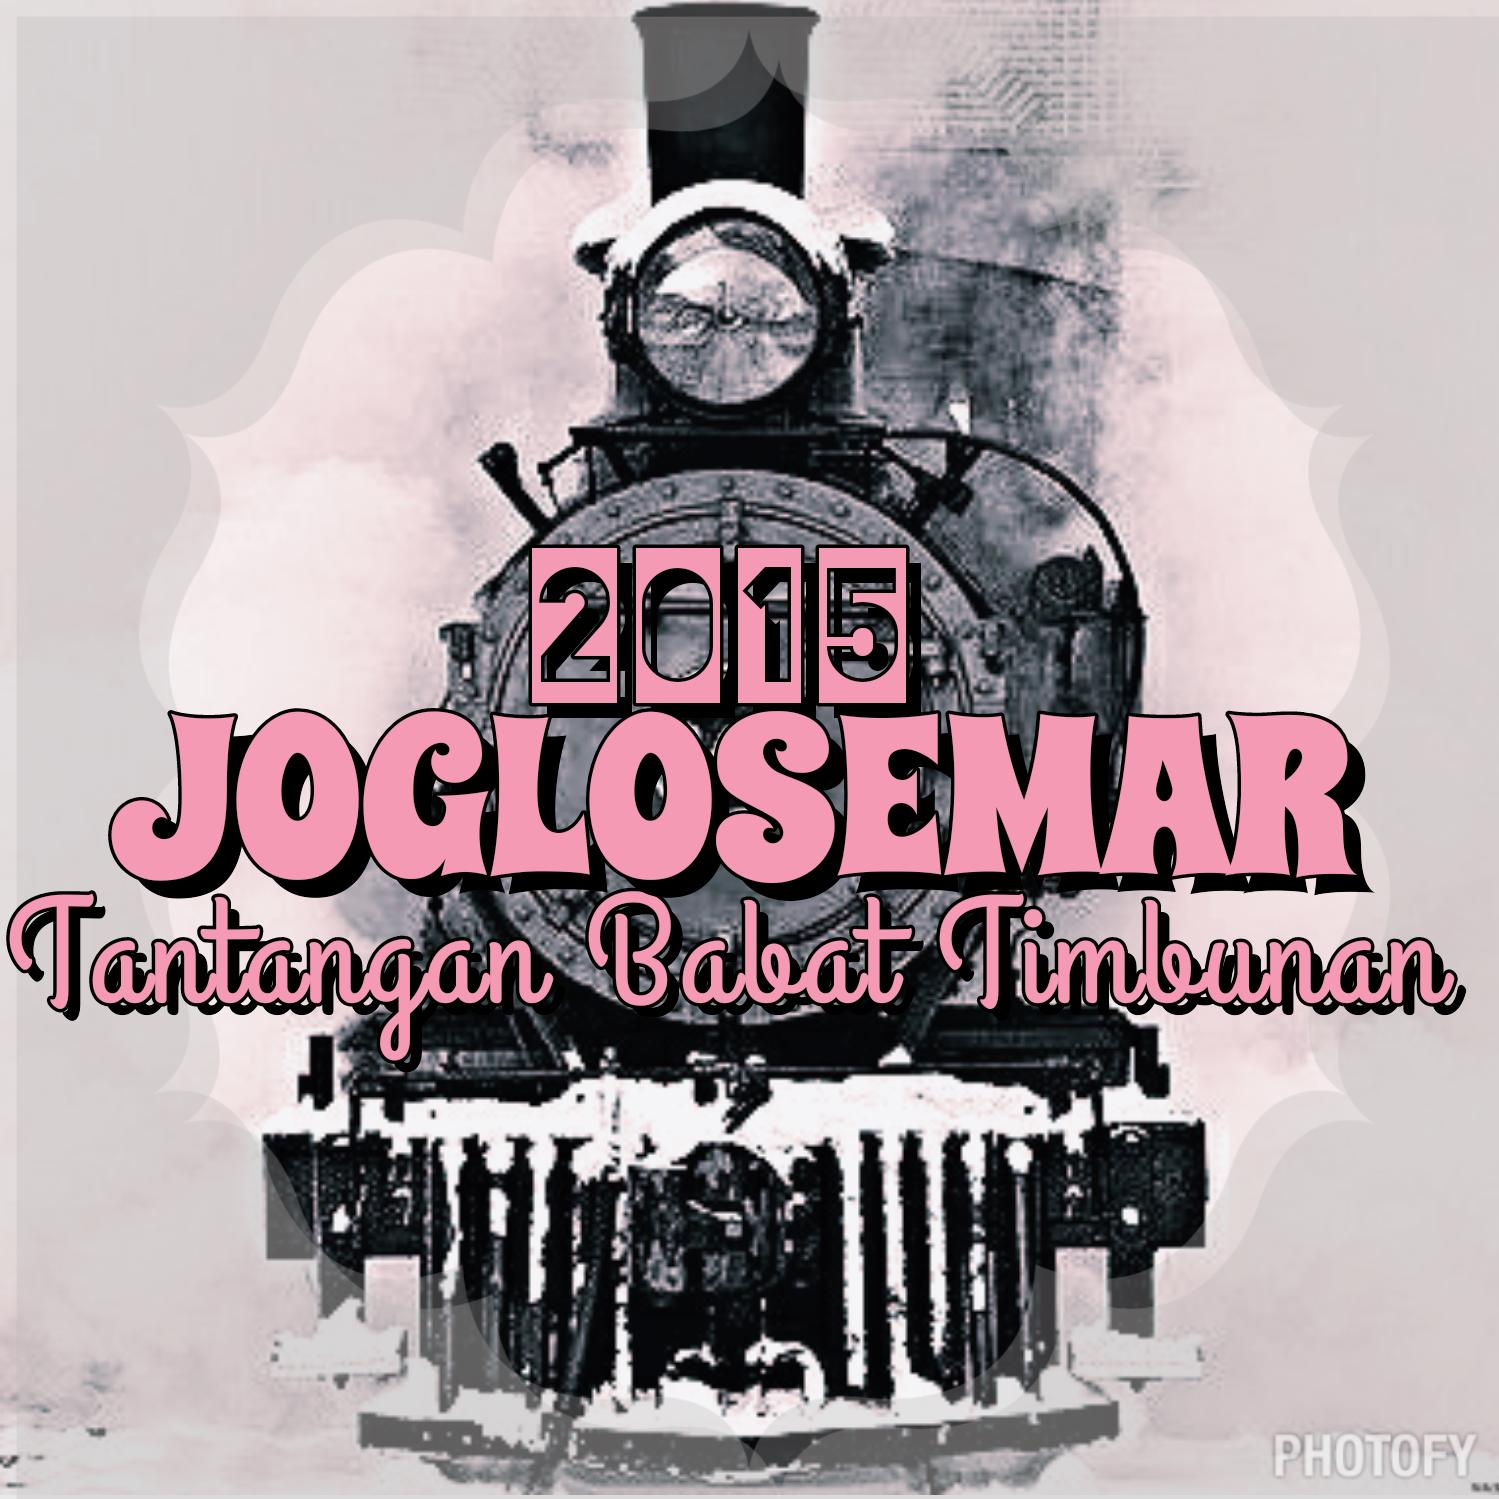 2015 Joglosemar Challenge